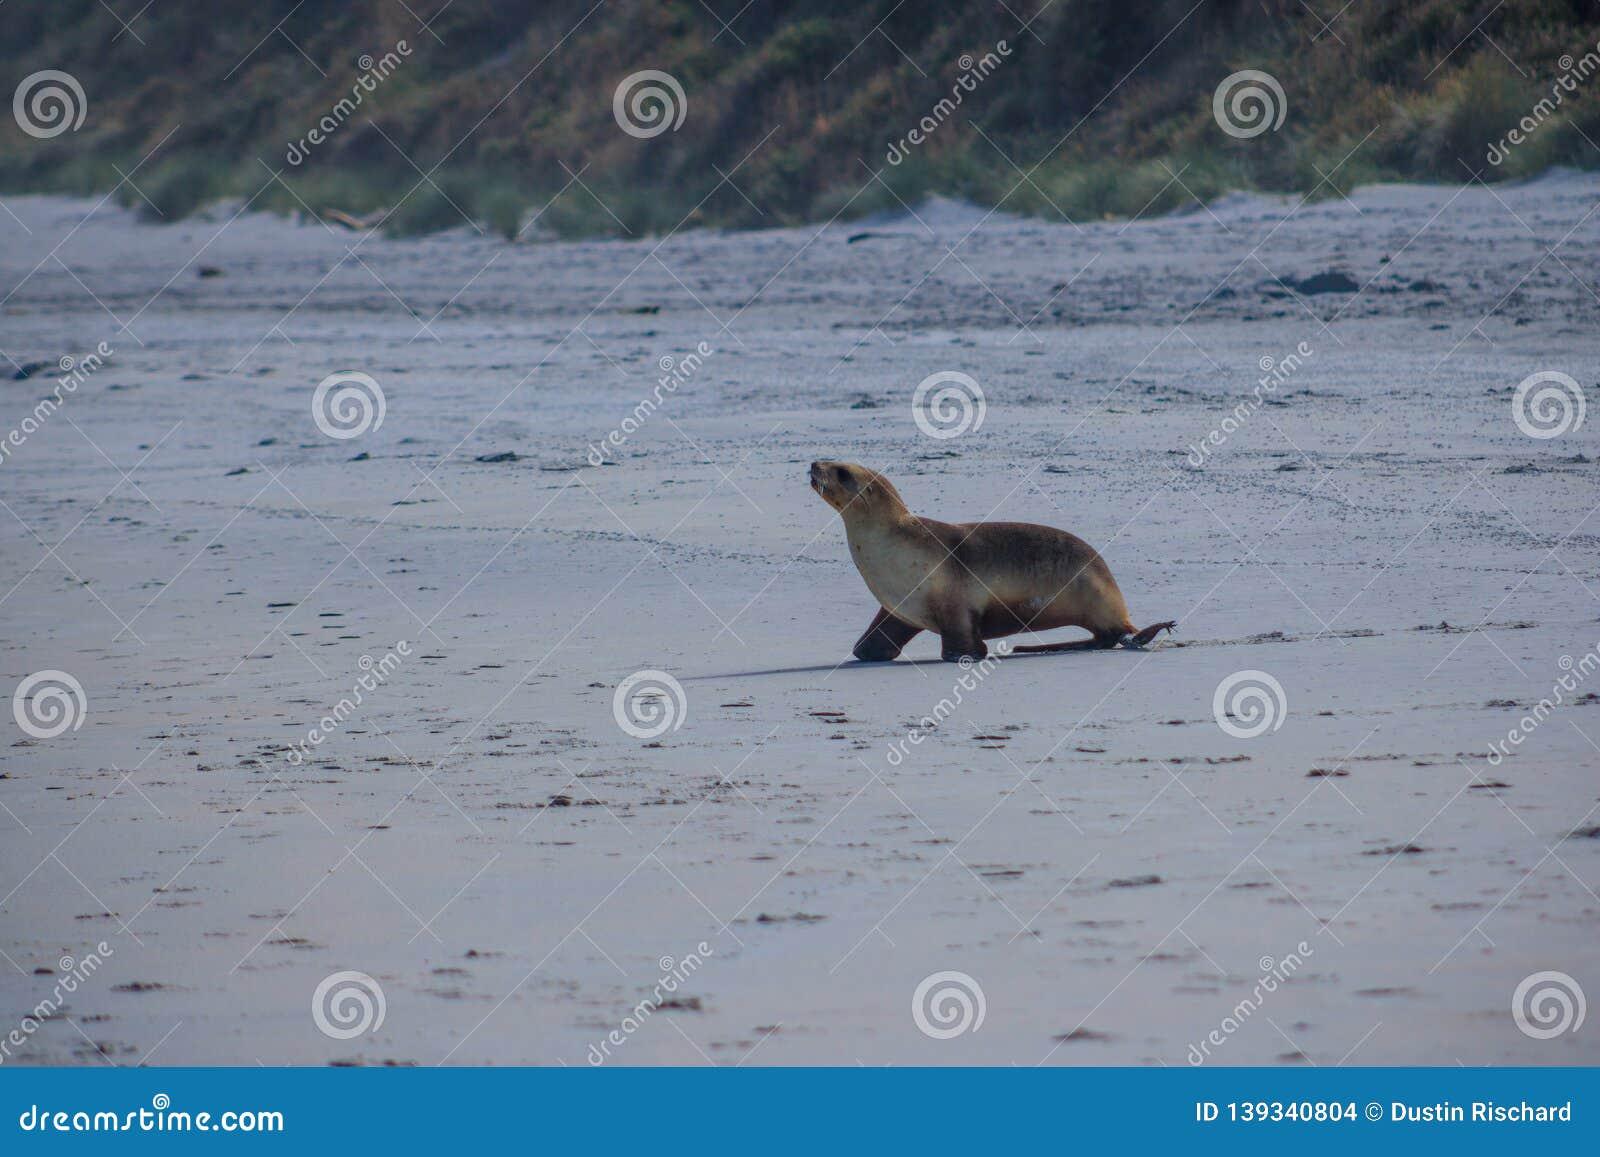 Fur seal walking towards the ocean at Allans beach